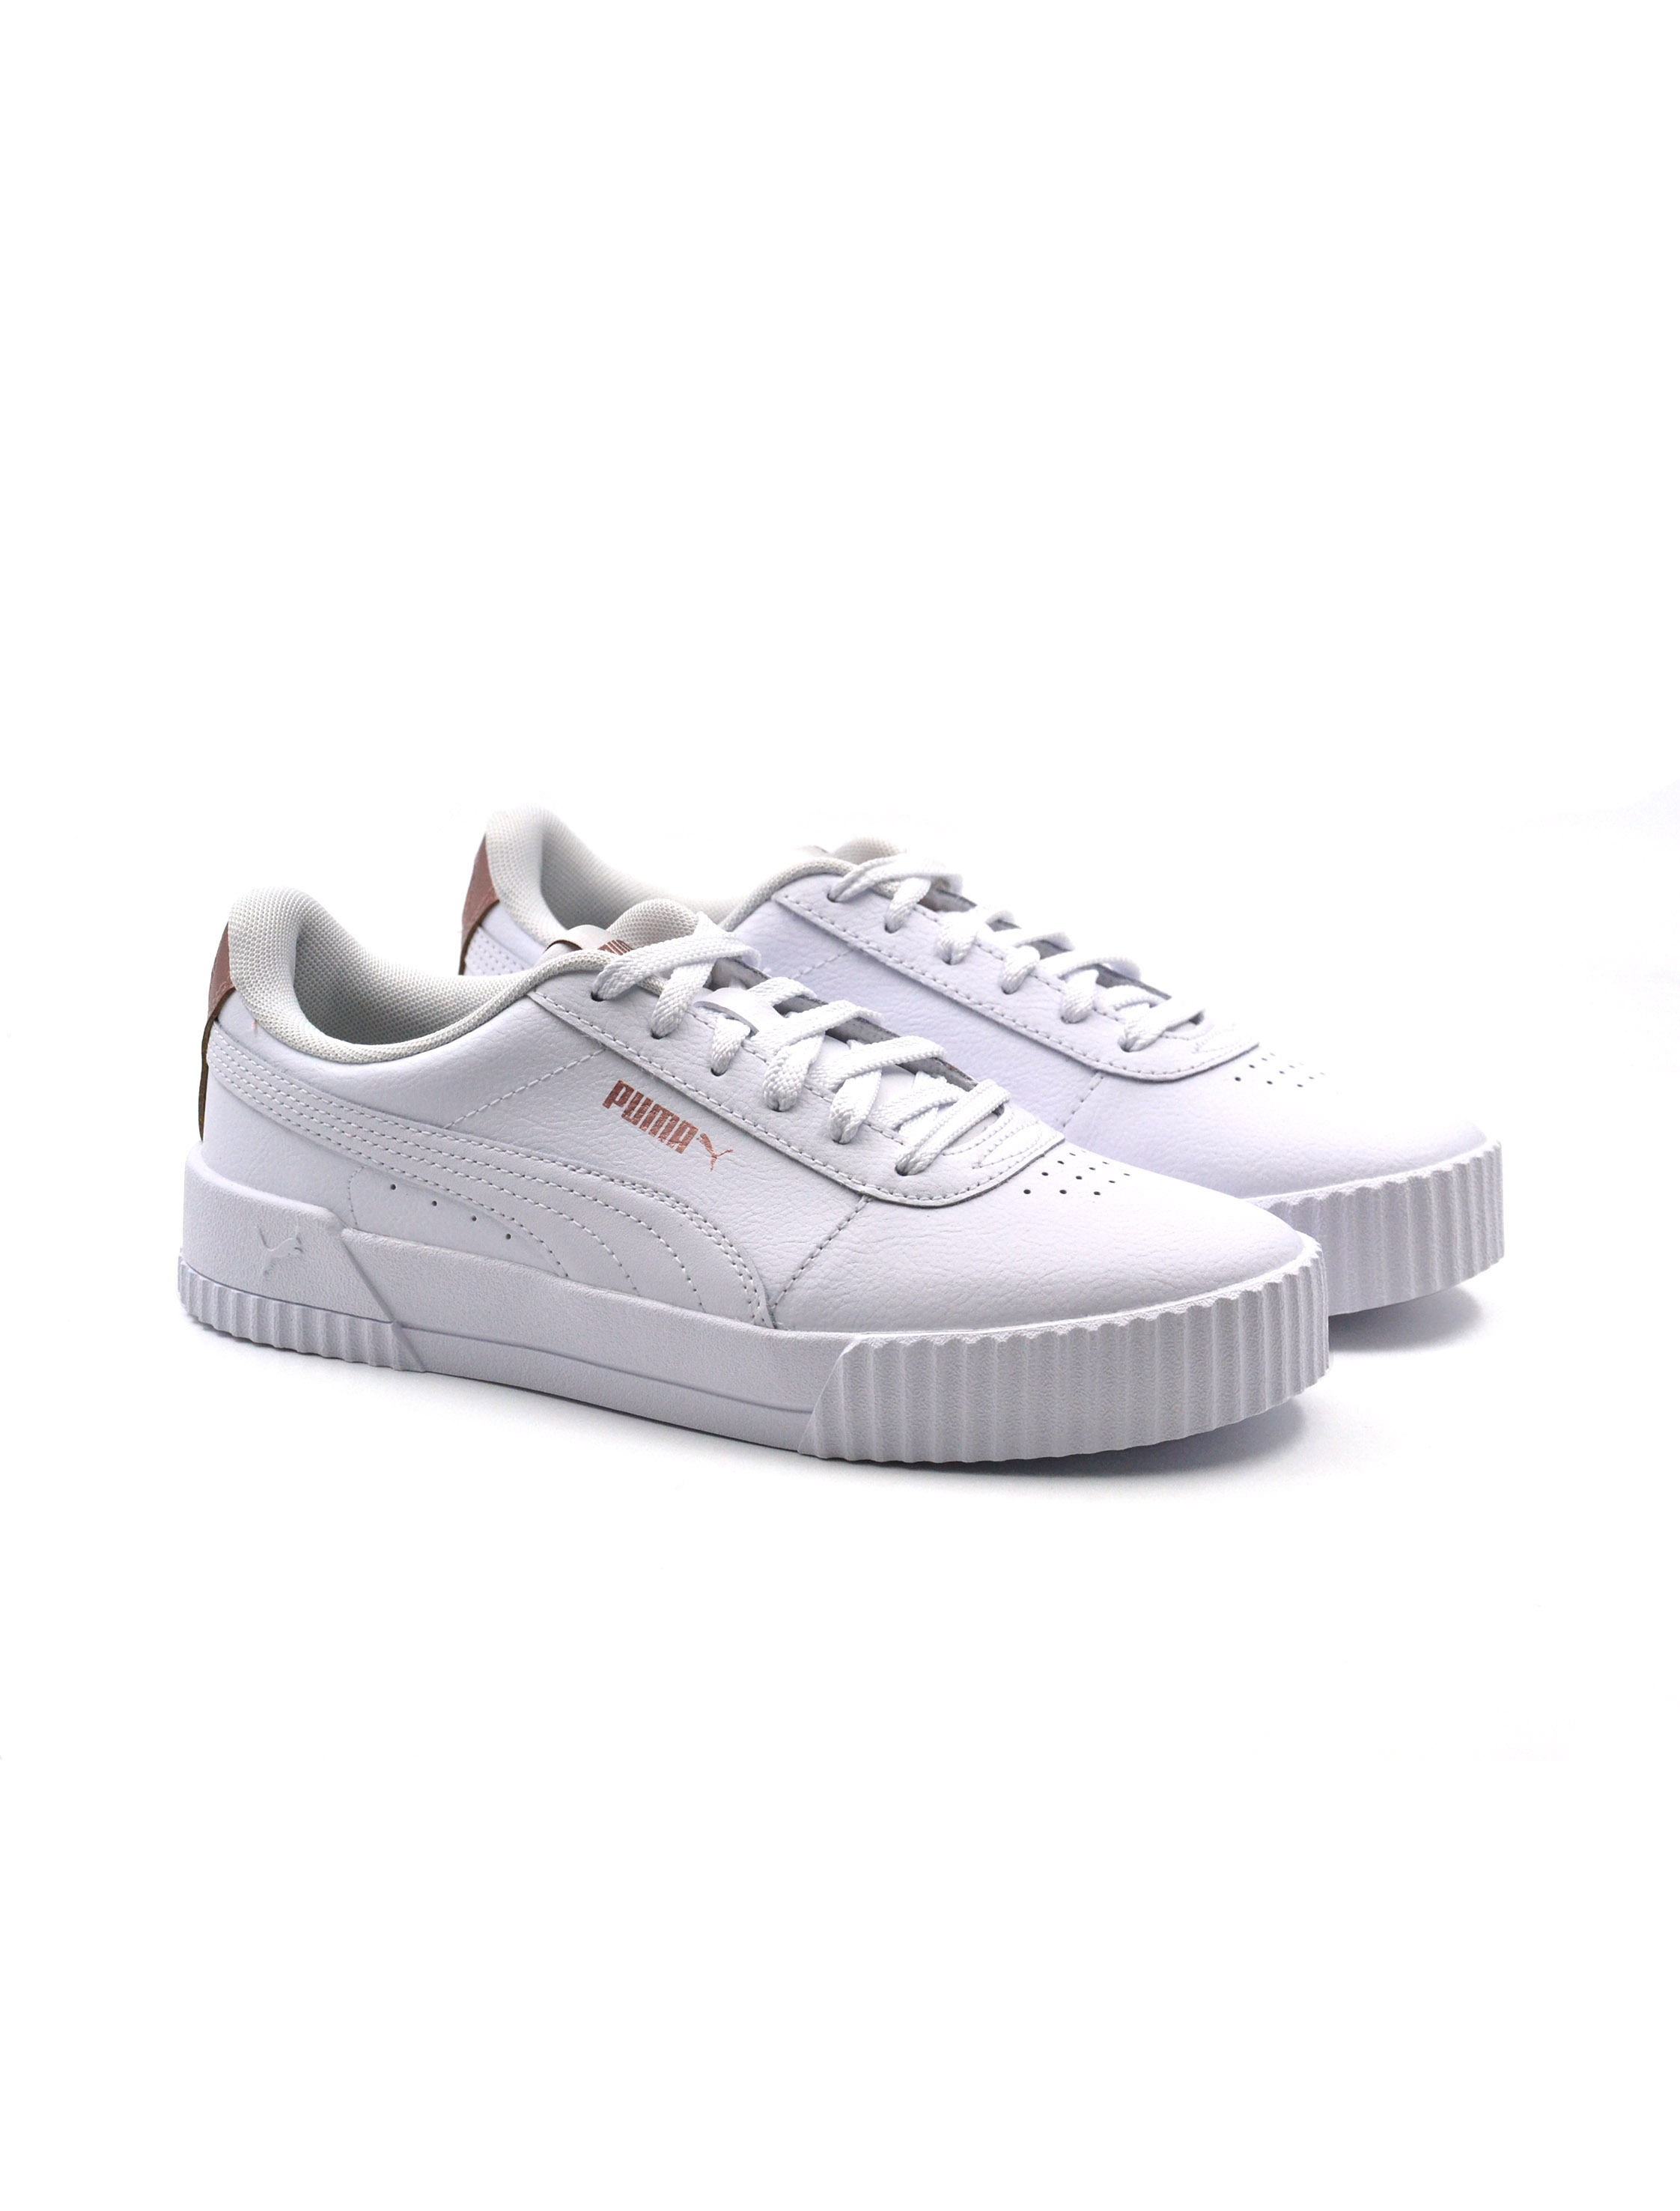 Puma carina rg wn s sneaker da donna, Sneakers, colore 001